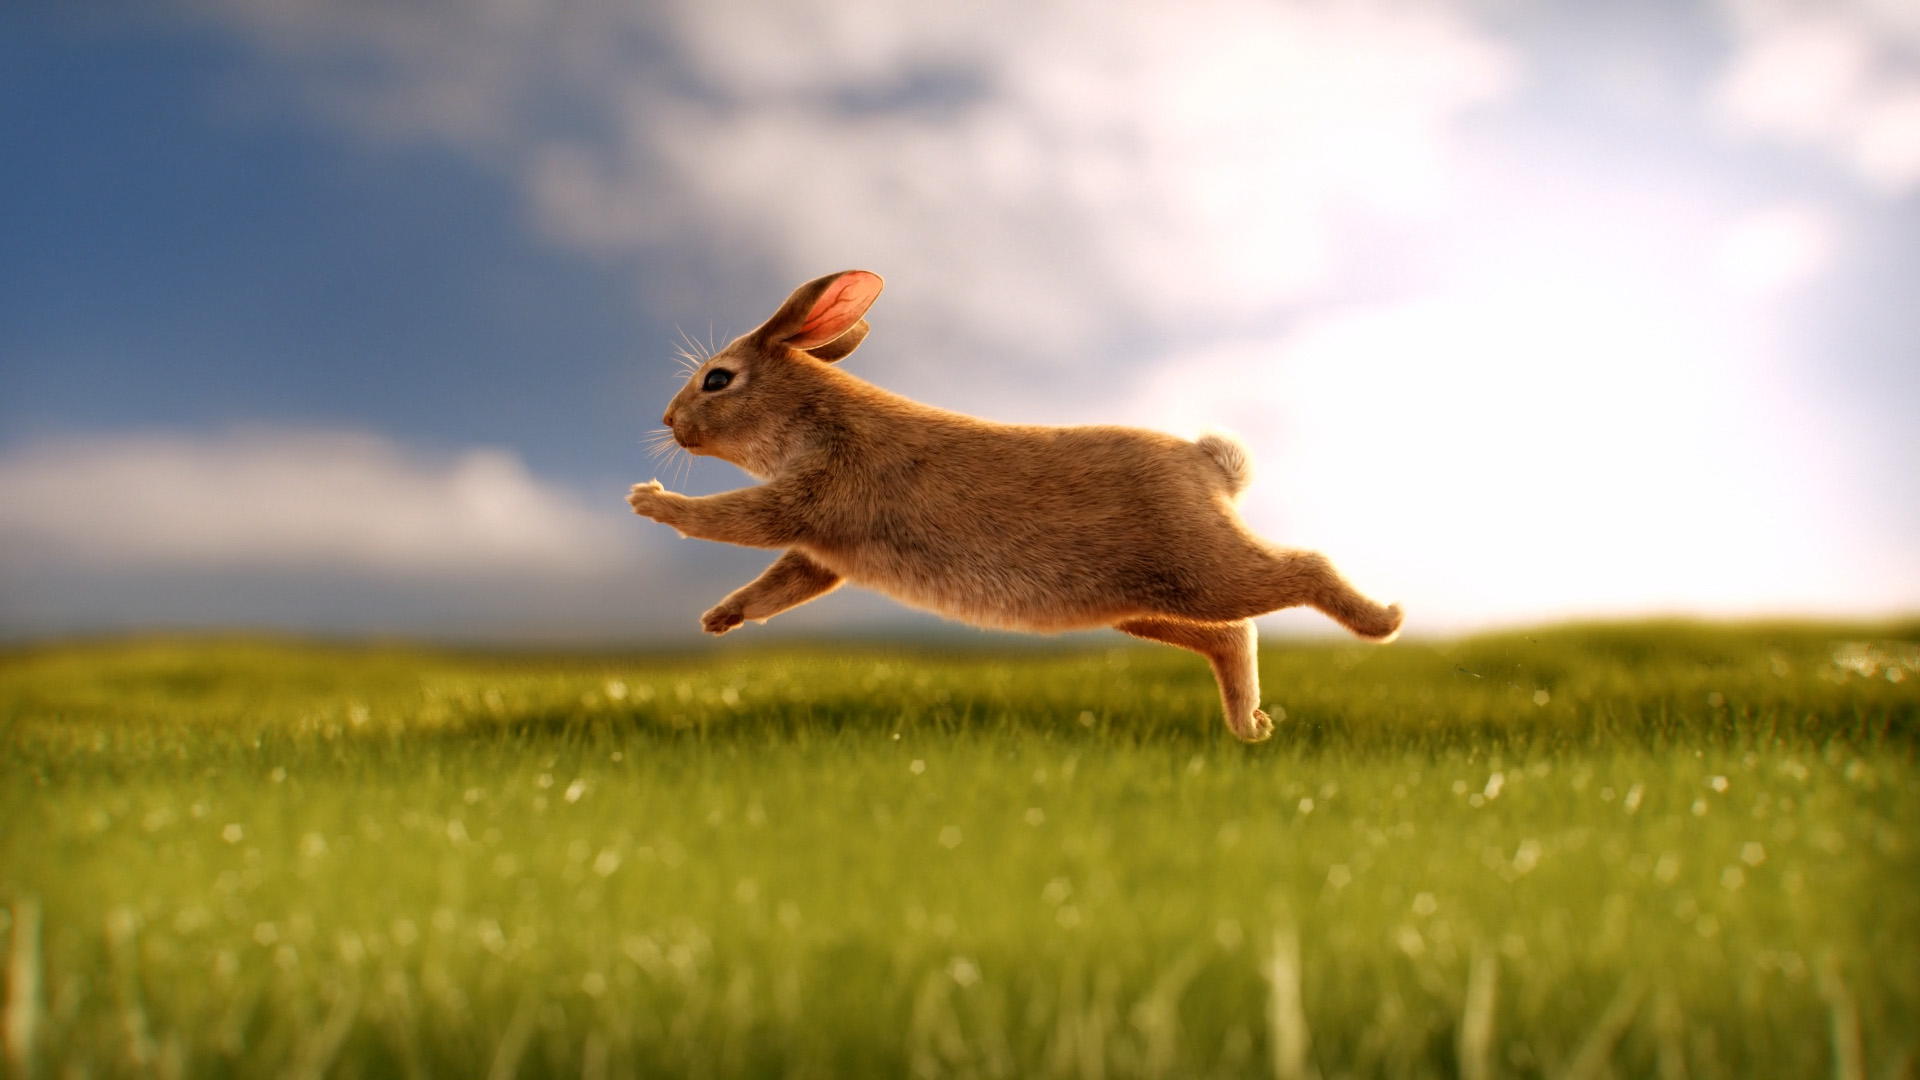 Penny - Bunny